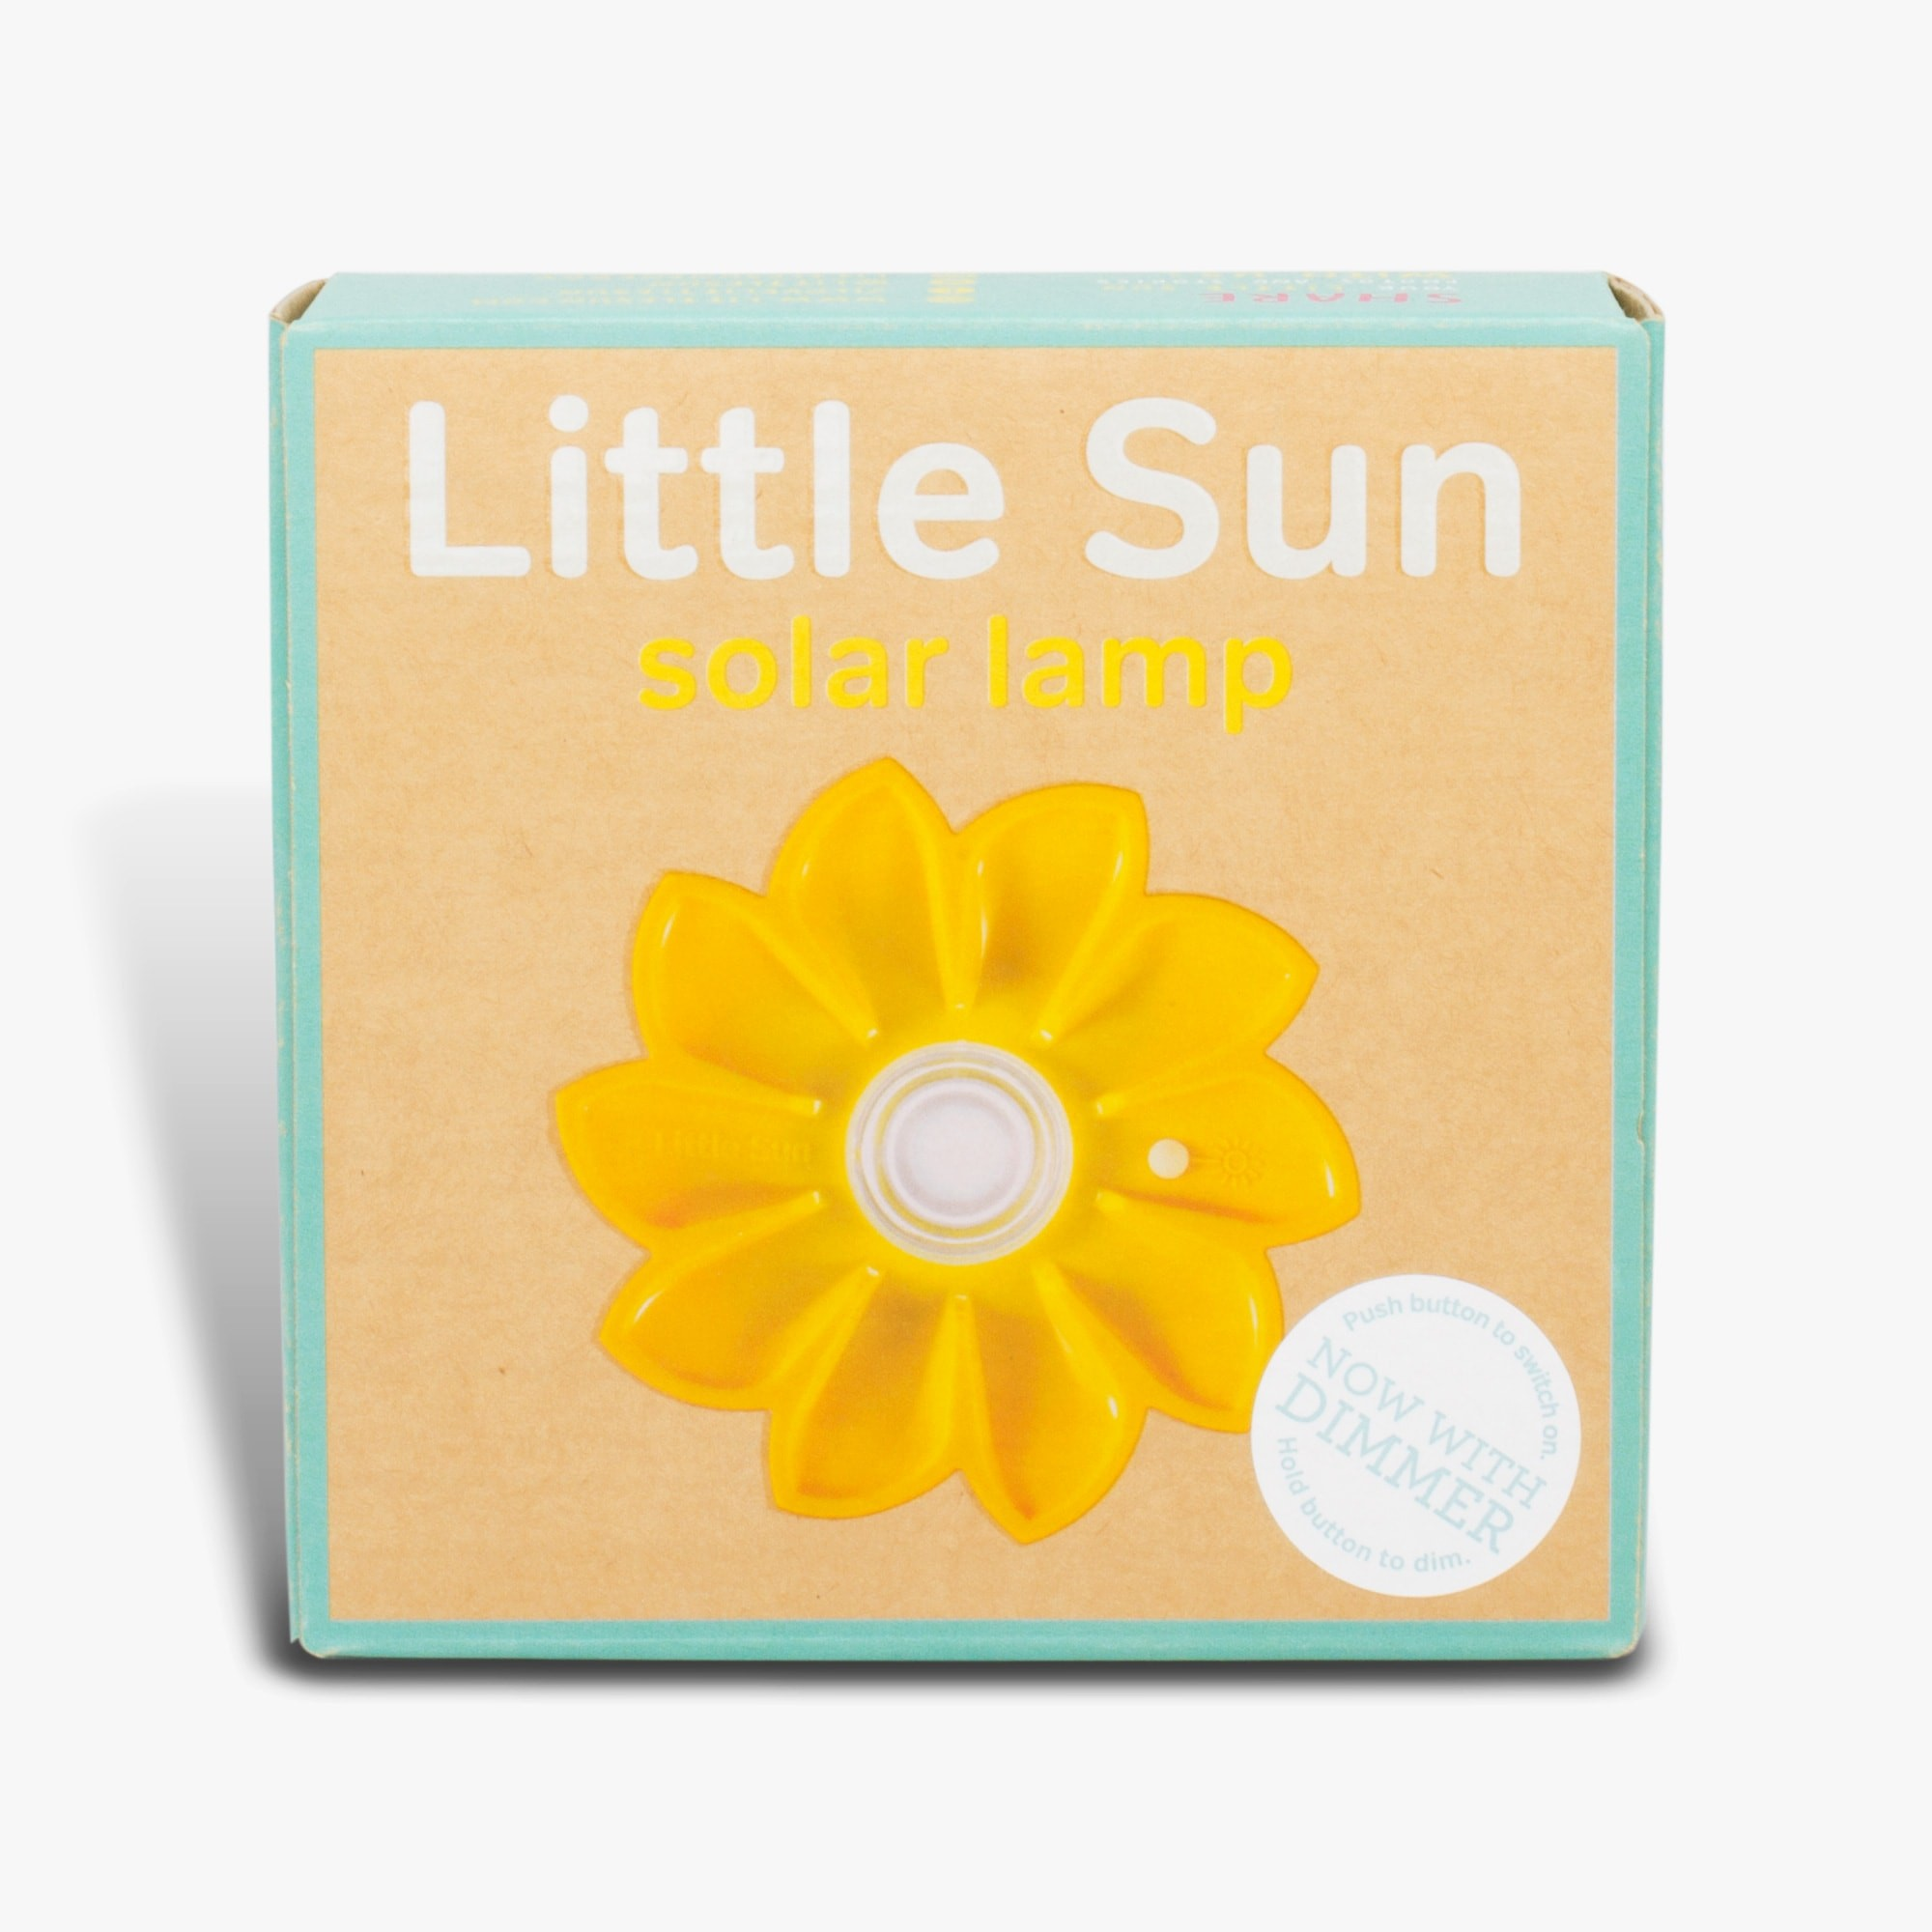 Little Sun - Home | New Museum Store